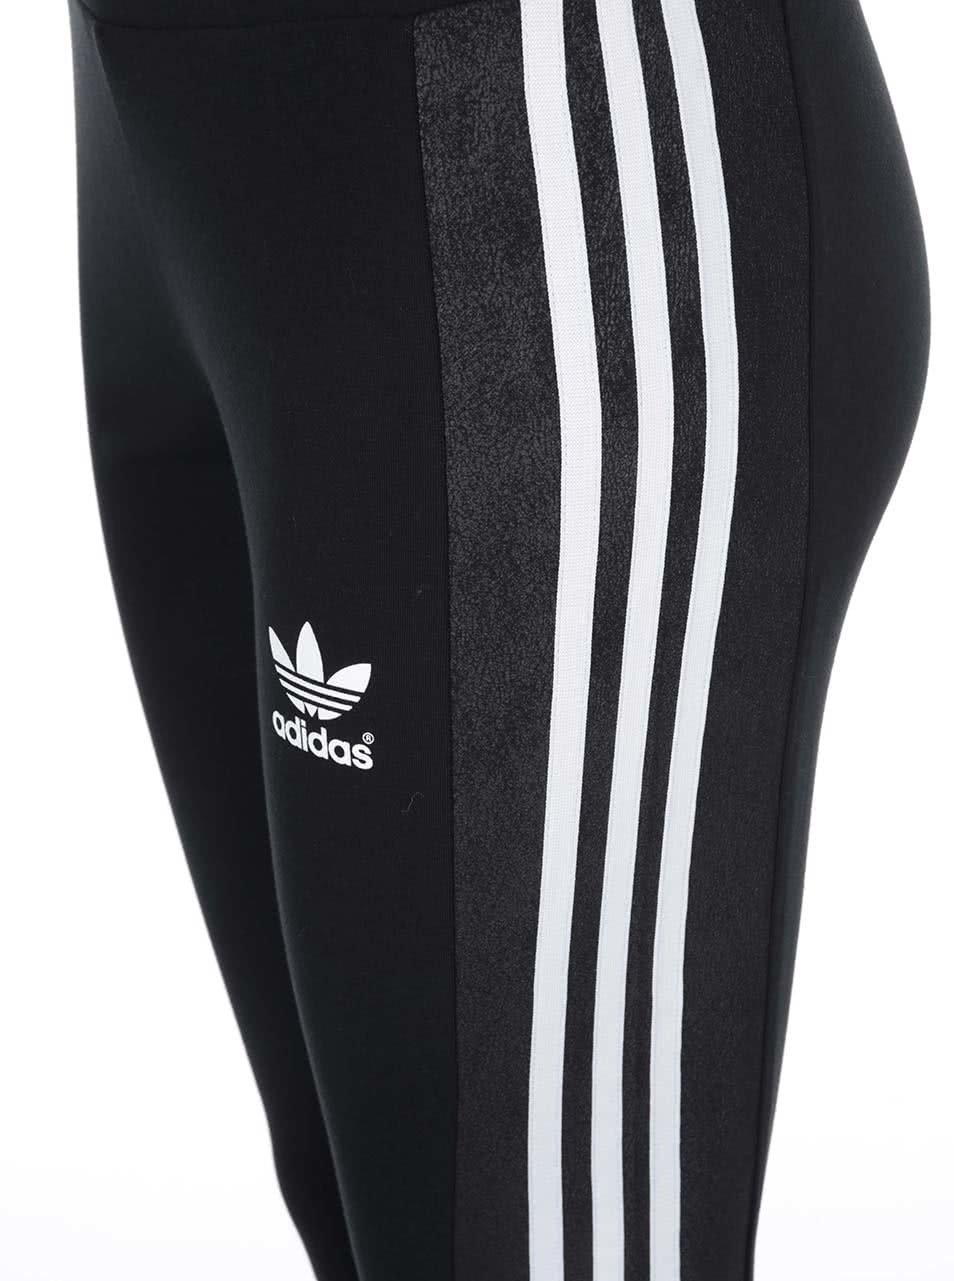 Černé dámské legíny adidas Originals Deluxe ... 633e8243c1